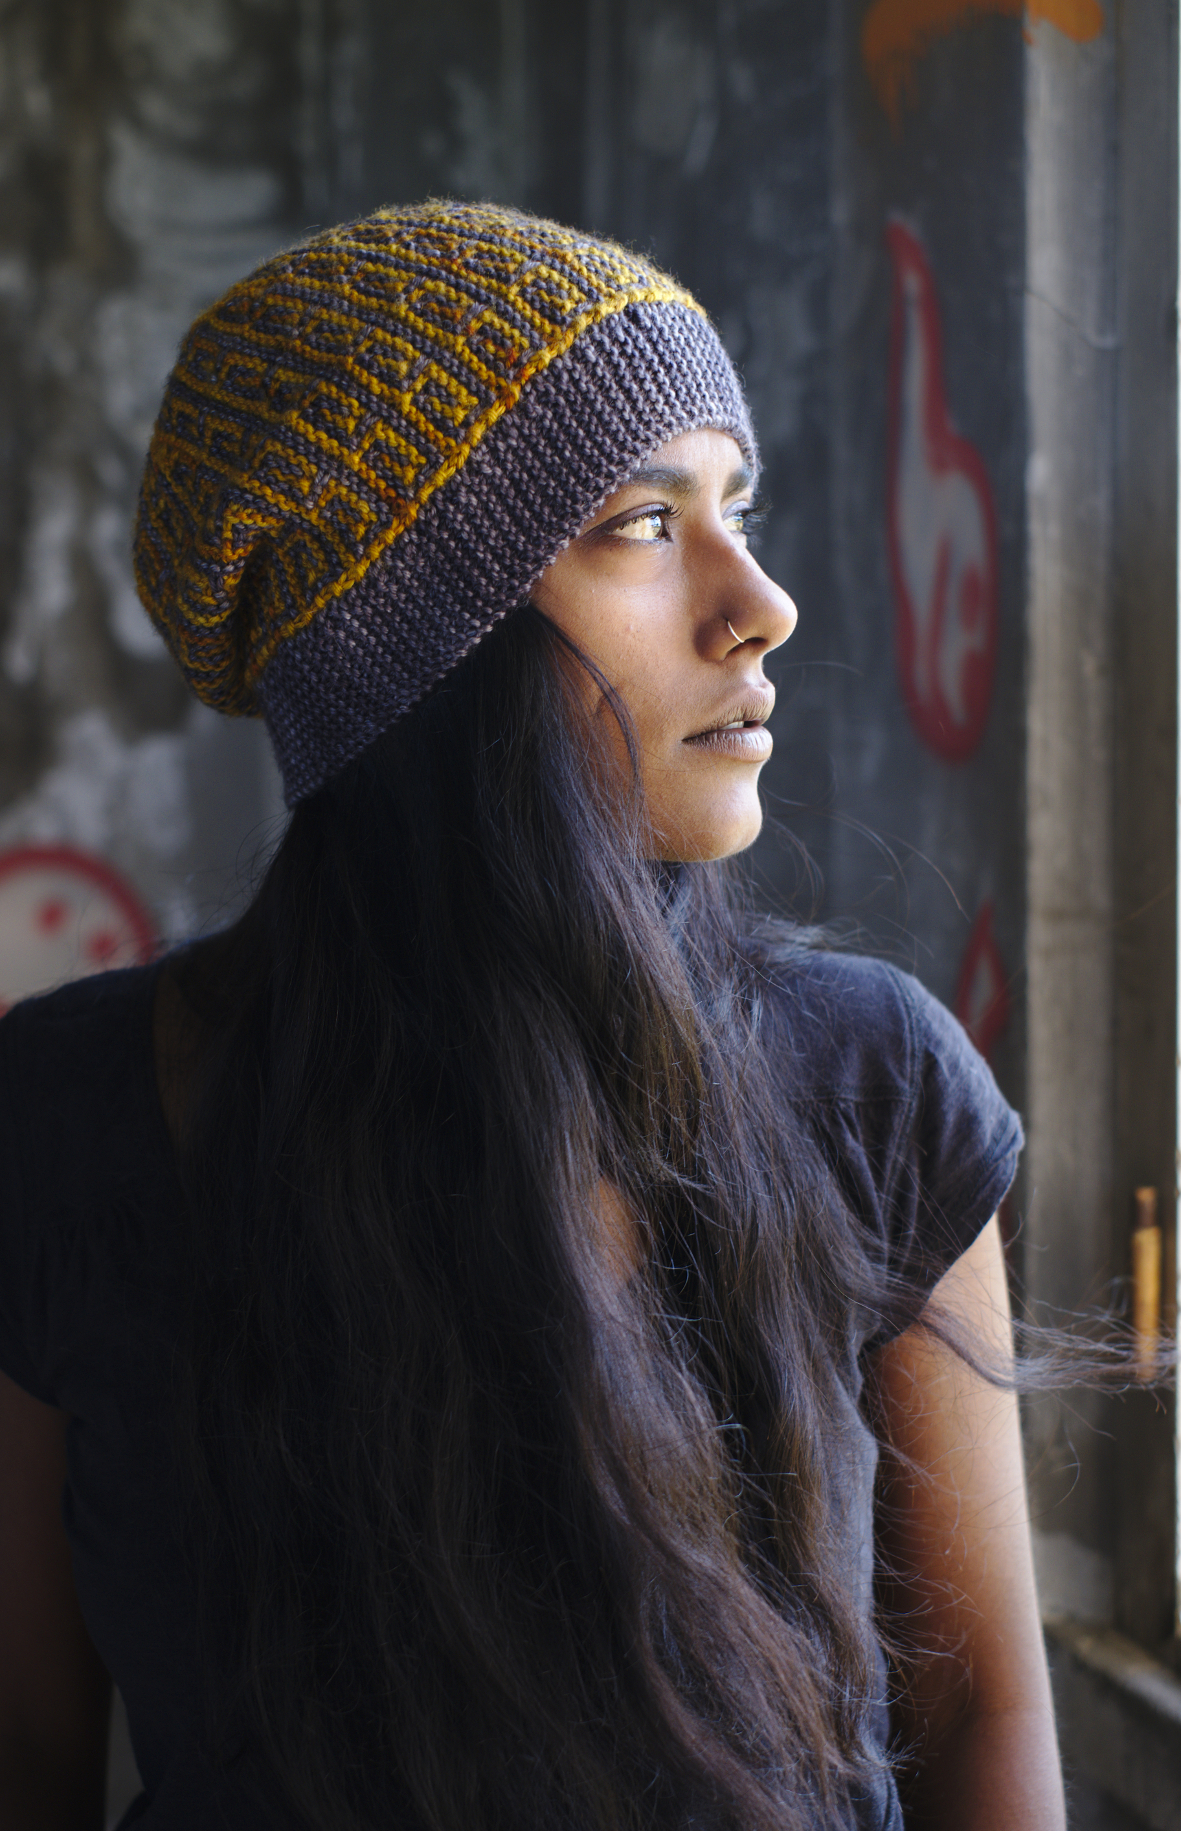 Revolutions sideways knit Hat hand knitting pattern for DK yarn